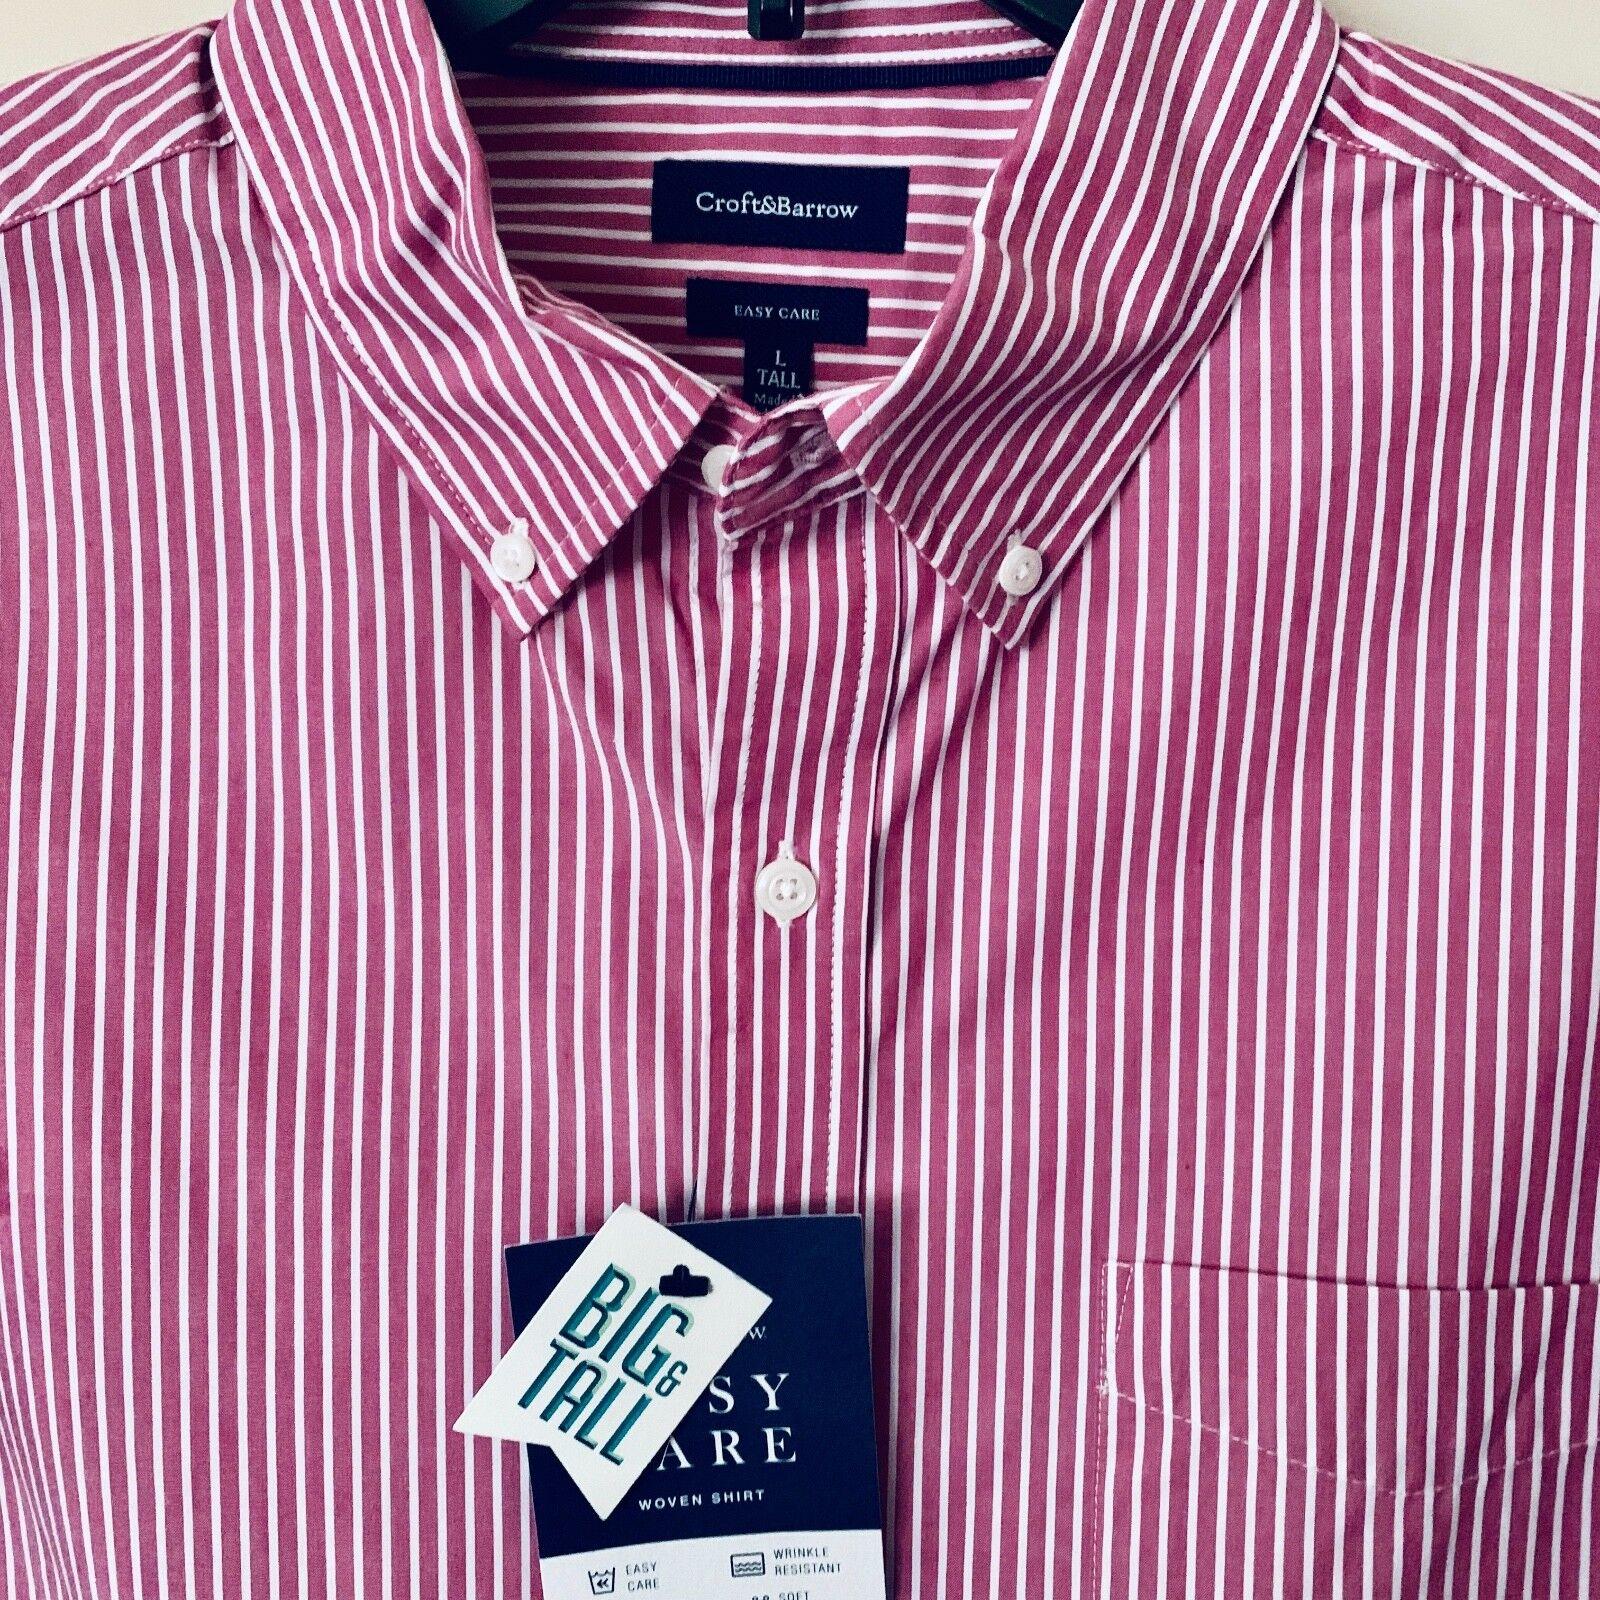 Croft & Barrow Short Sleeve Dress Shirt NWT Mens Big & Tall